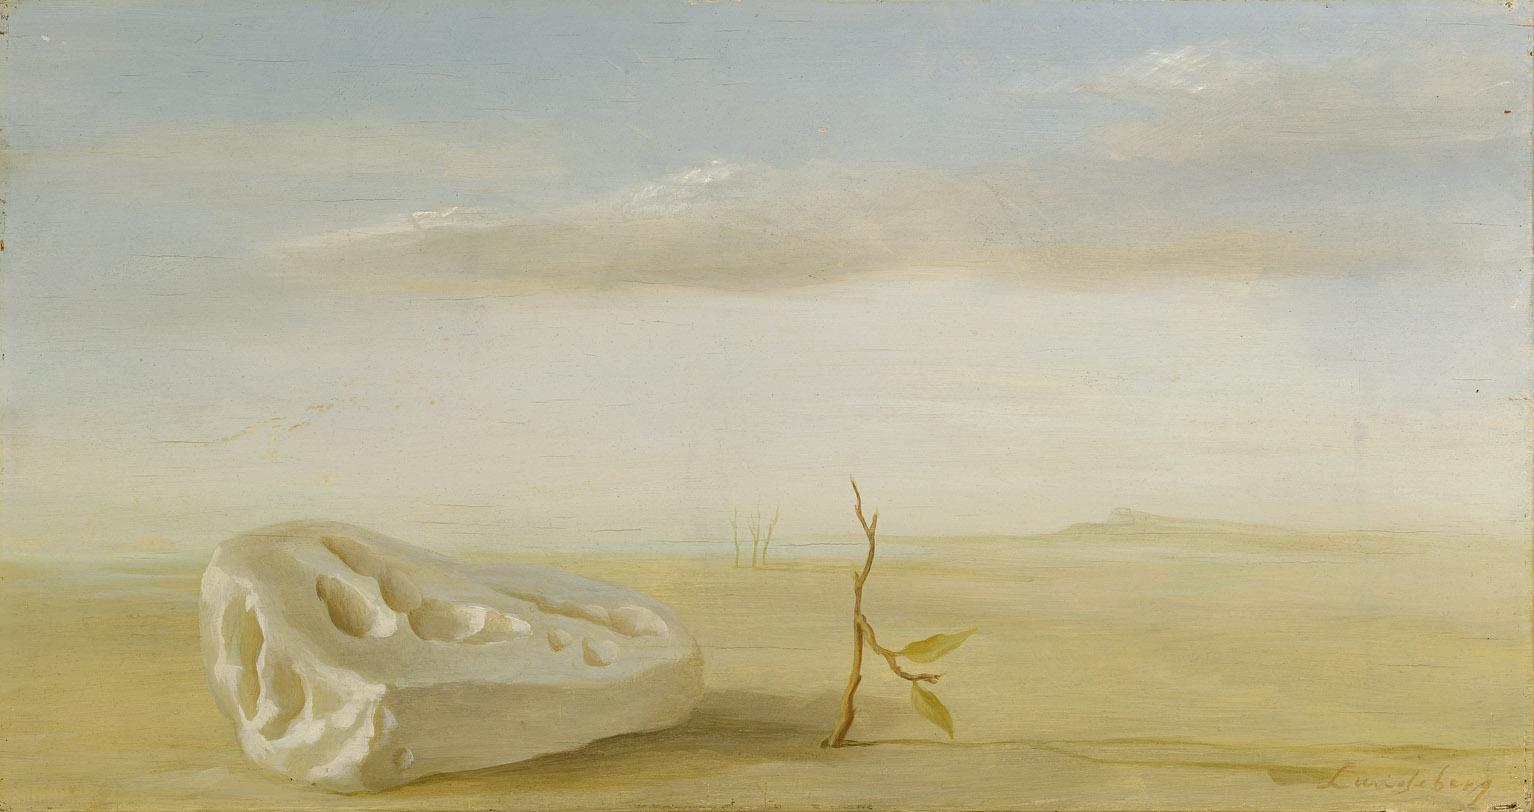 Untitled Composition (Landscape)